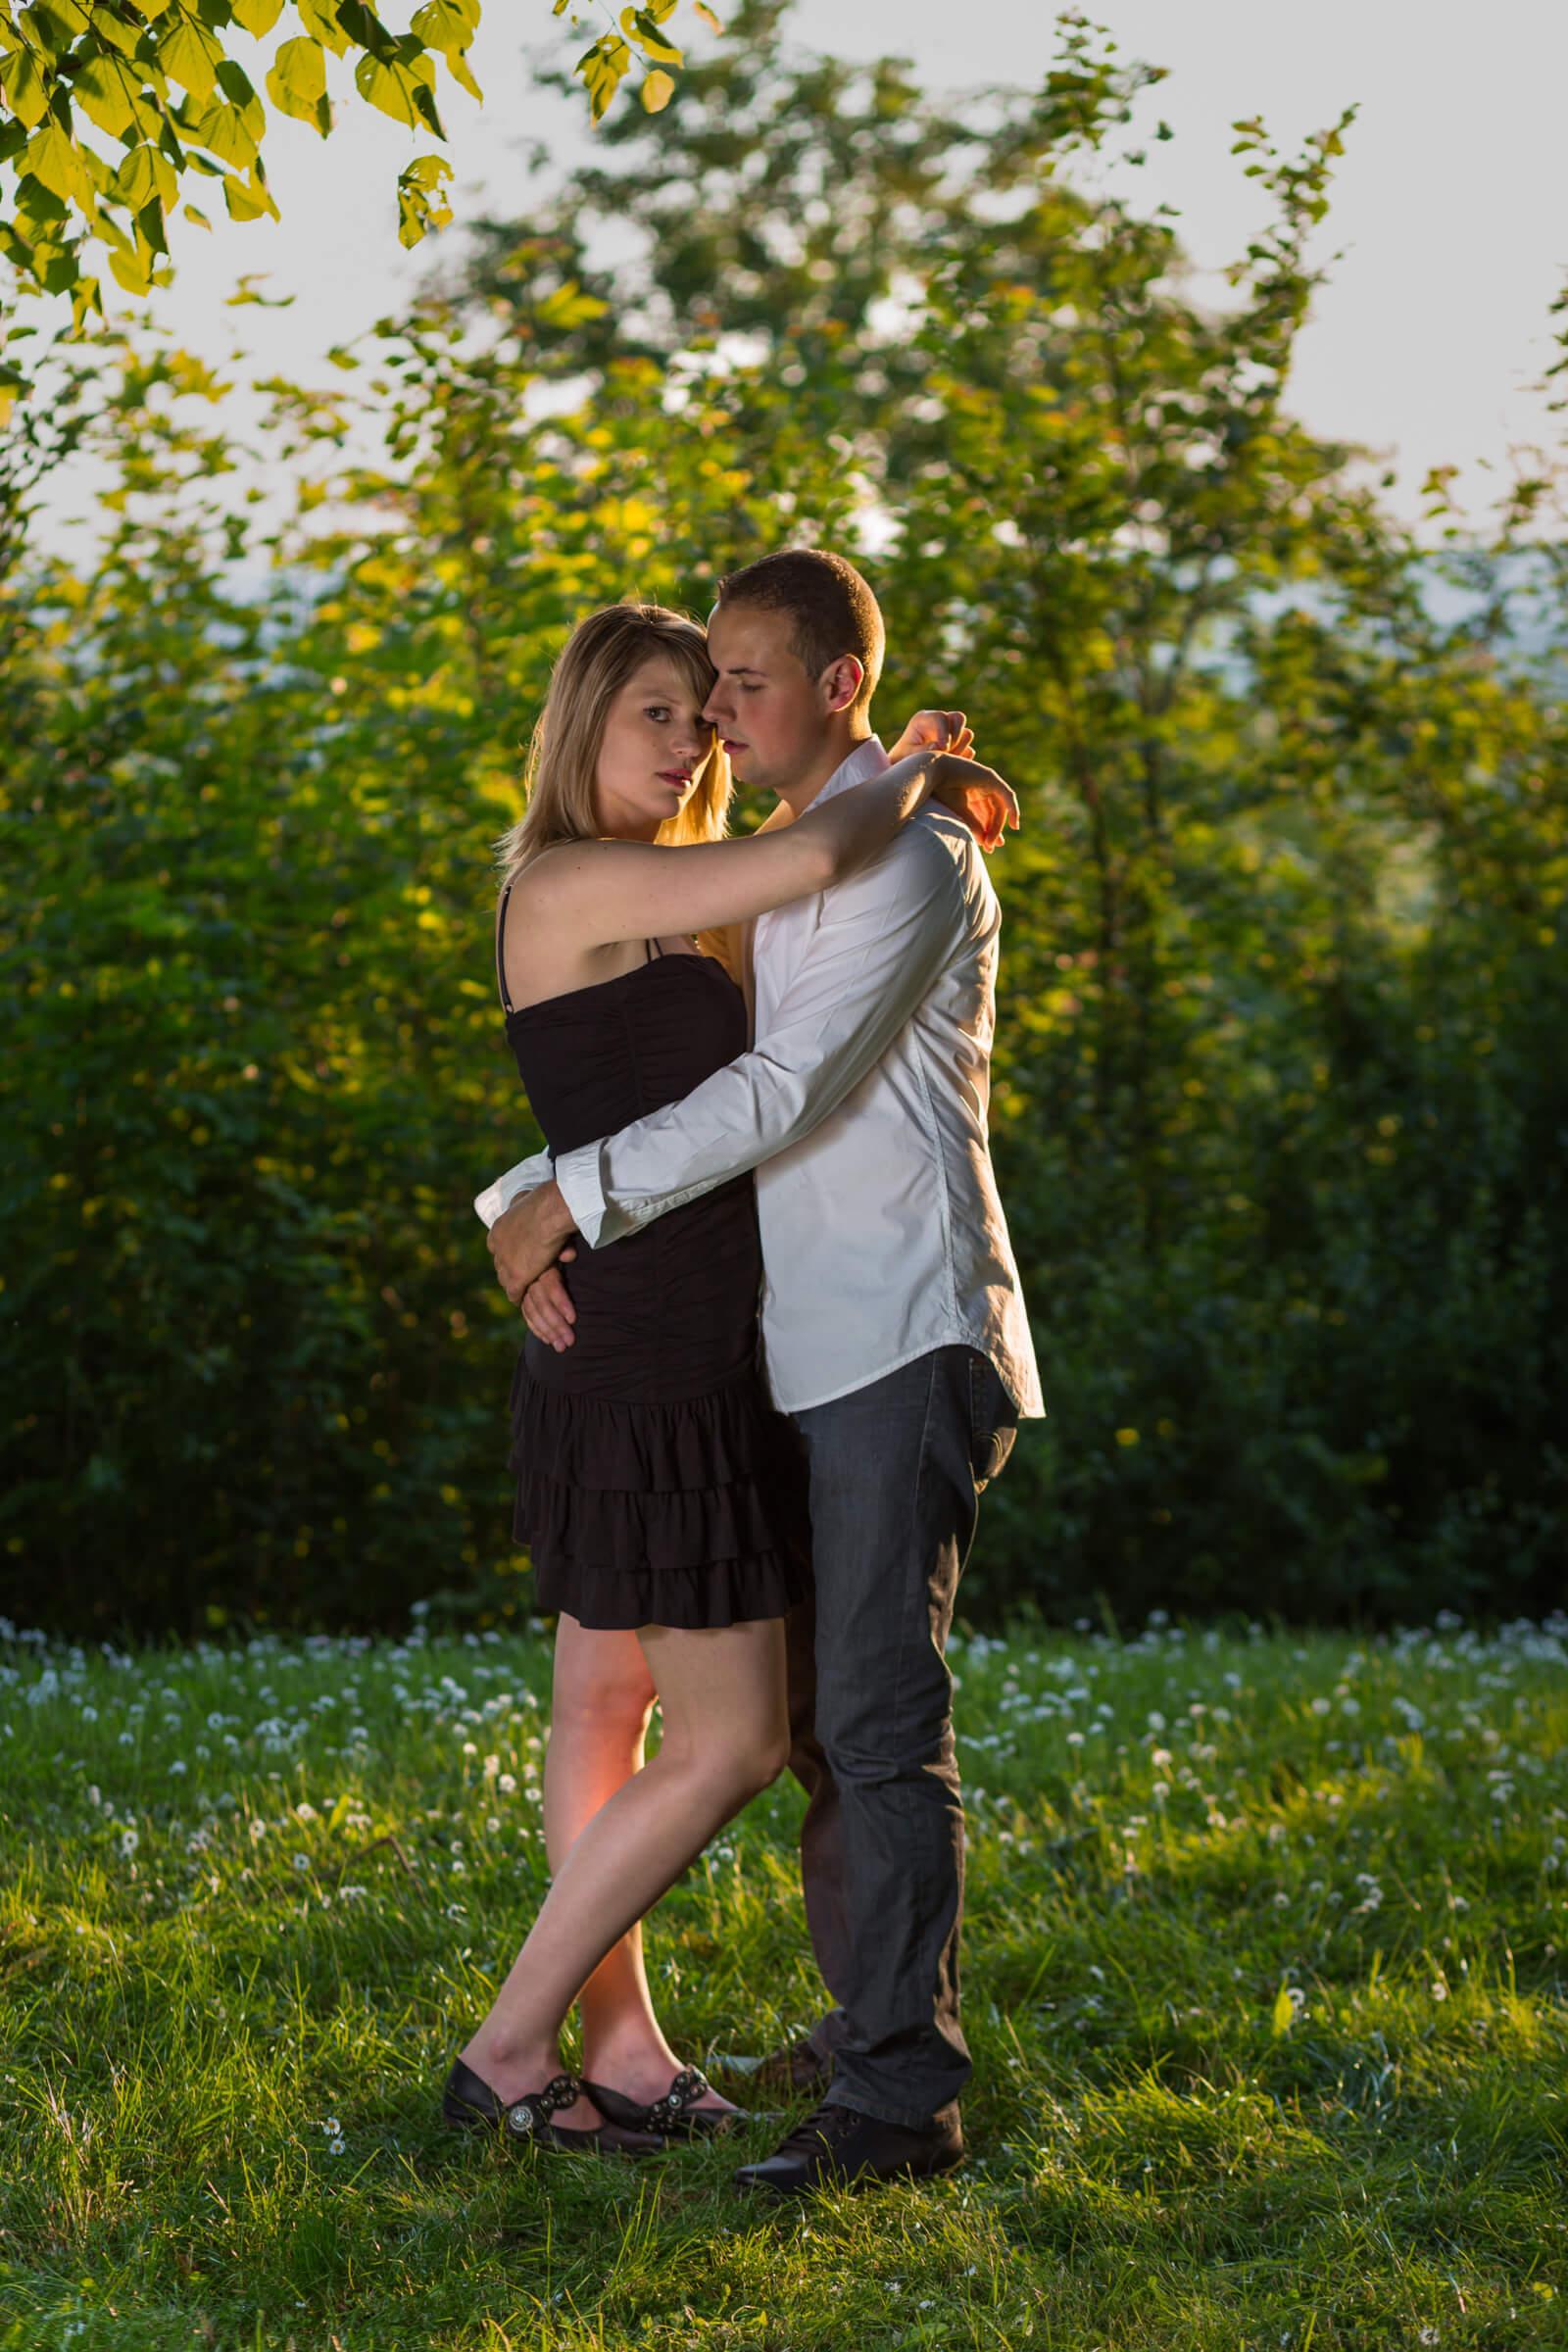 Photographe epernay Photo couple Tristan Meunier-7.jpg